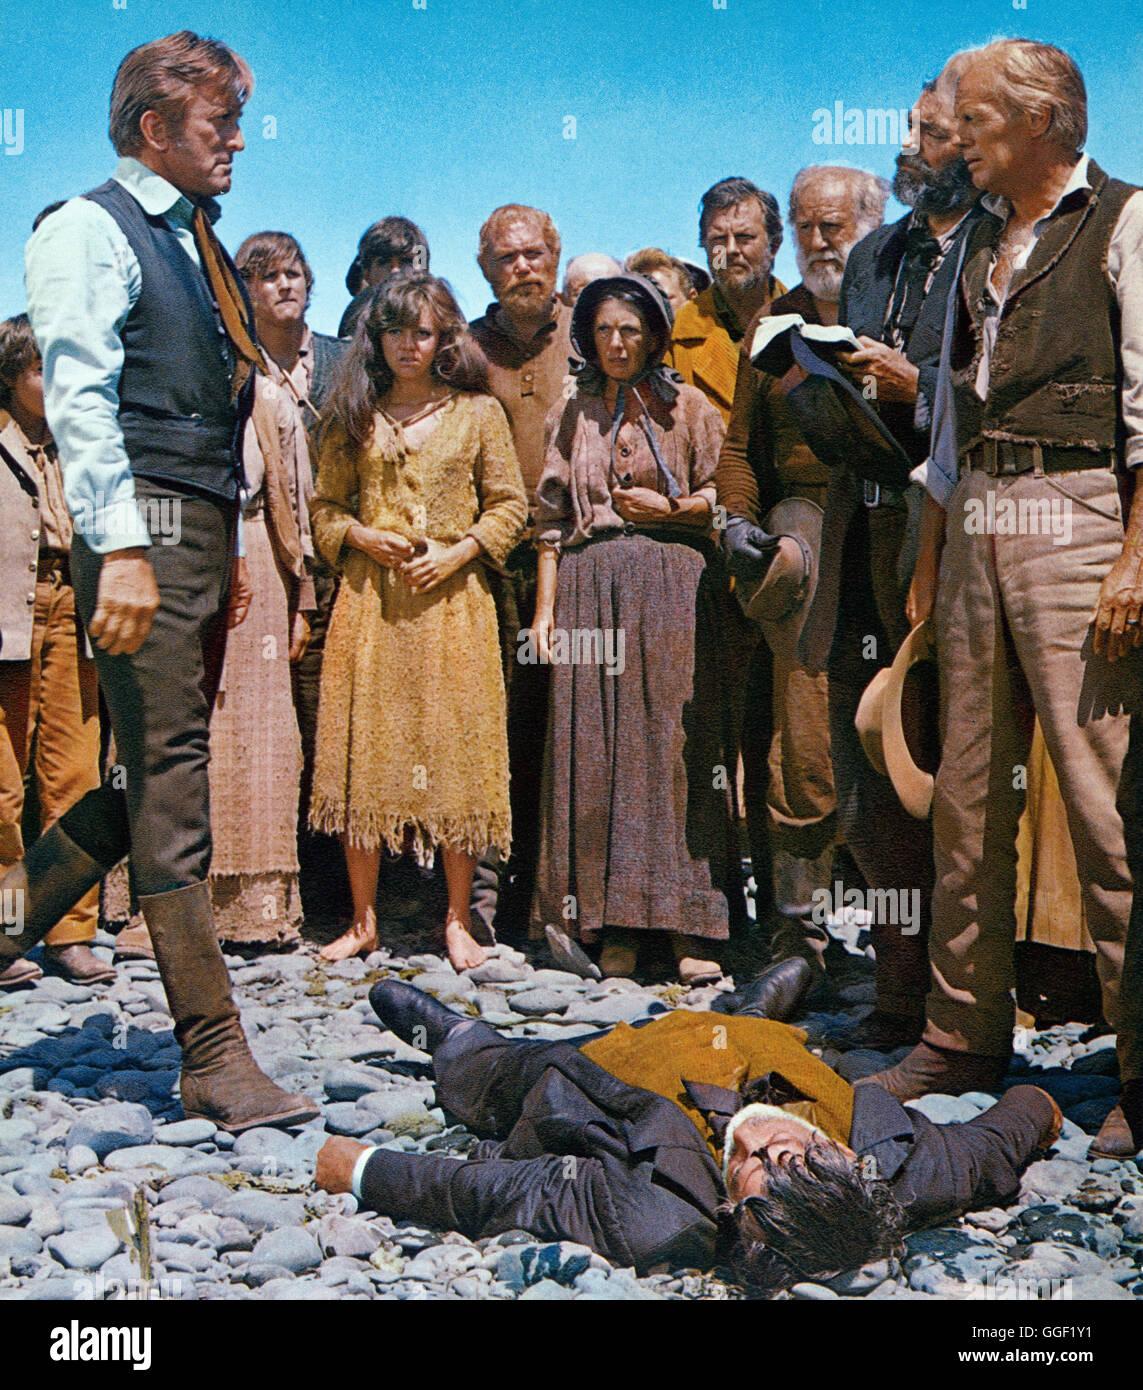 DER WEG NACH WESTEN / The Way West USA 1966 / Andrew V. McLaglen Filmszene mit KIRK DOUGLAS (Senator Tadlock), JACK - Stock Image